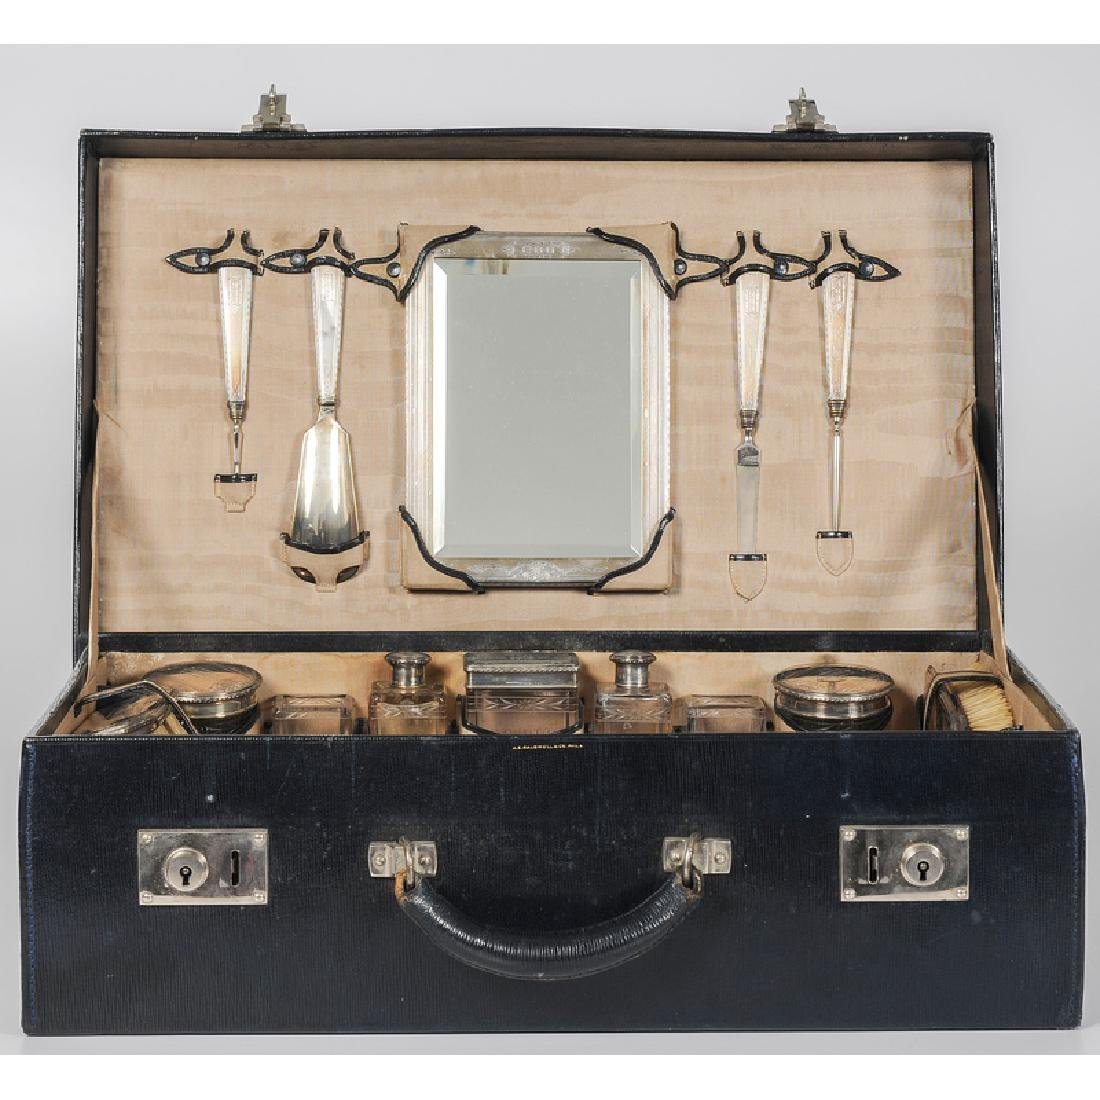 R. Blackington & Co. Gentleman's Traveling Toiletry